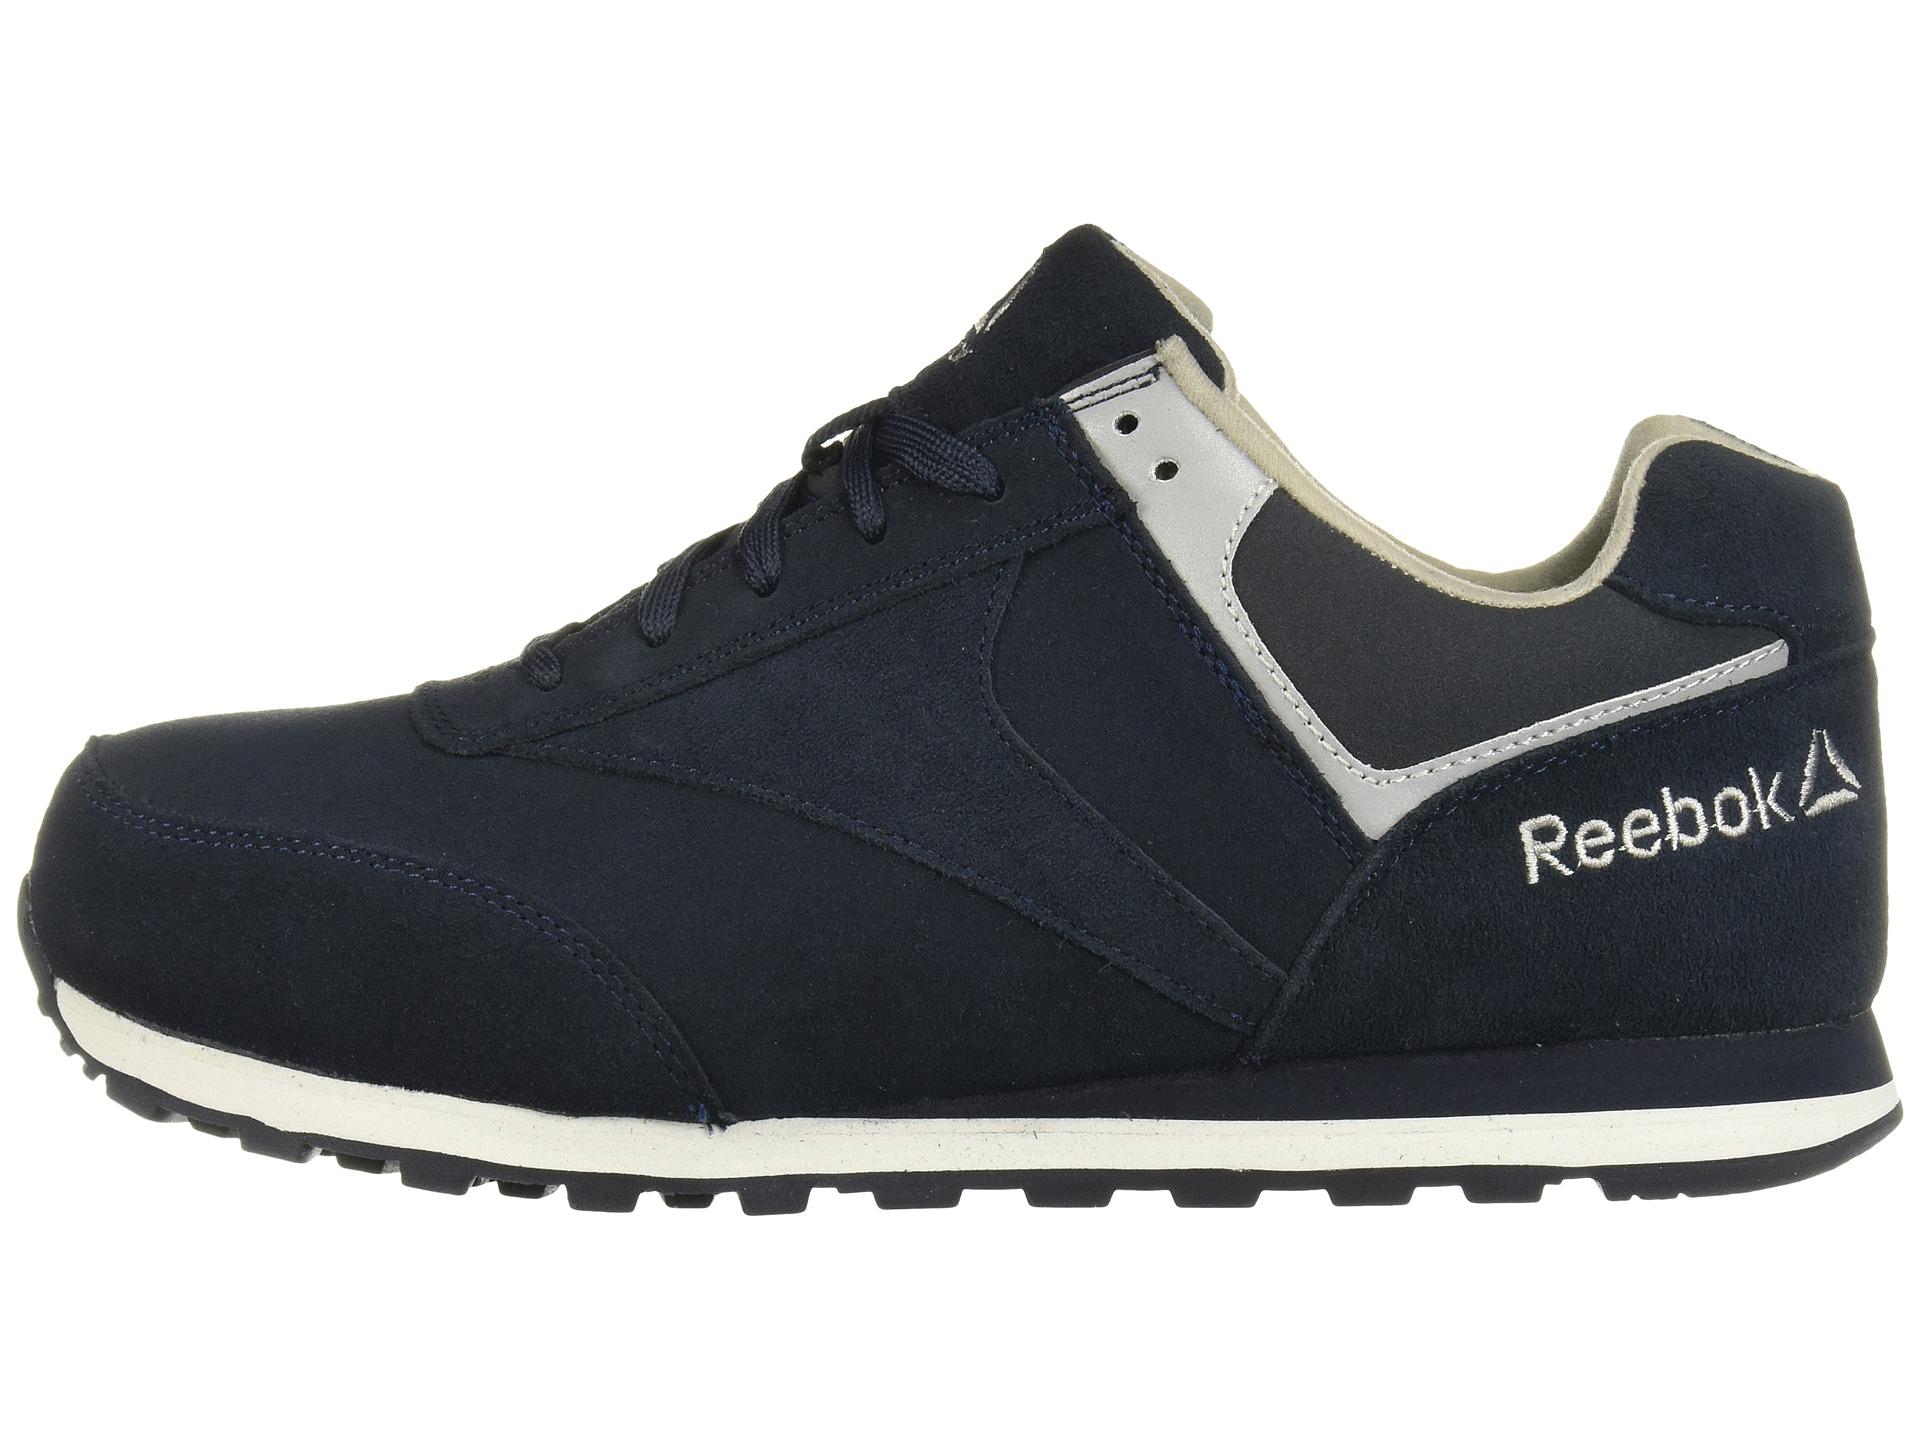 6d76f940ee6 Buy skate steel toe shoes   OFF45% Discounted